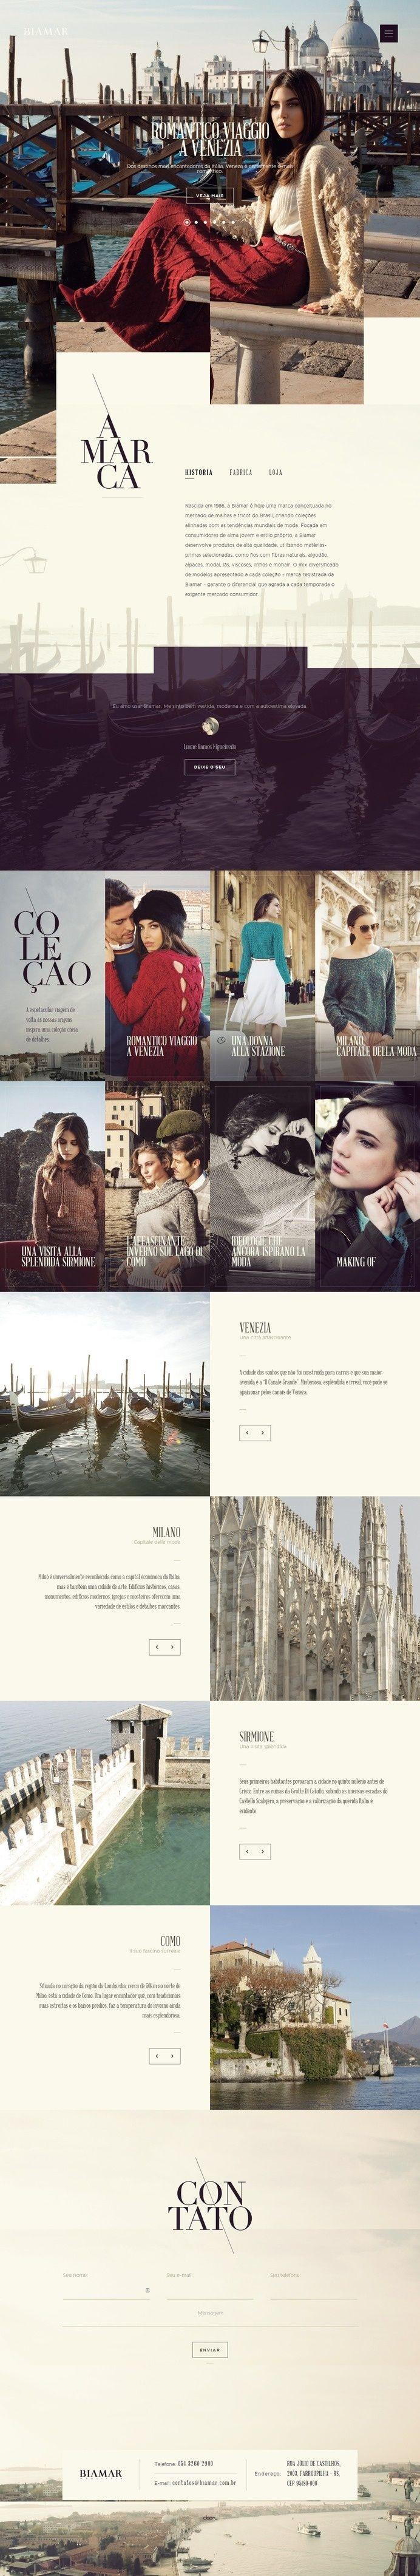 Biamar – Flat UI Design Website in Website